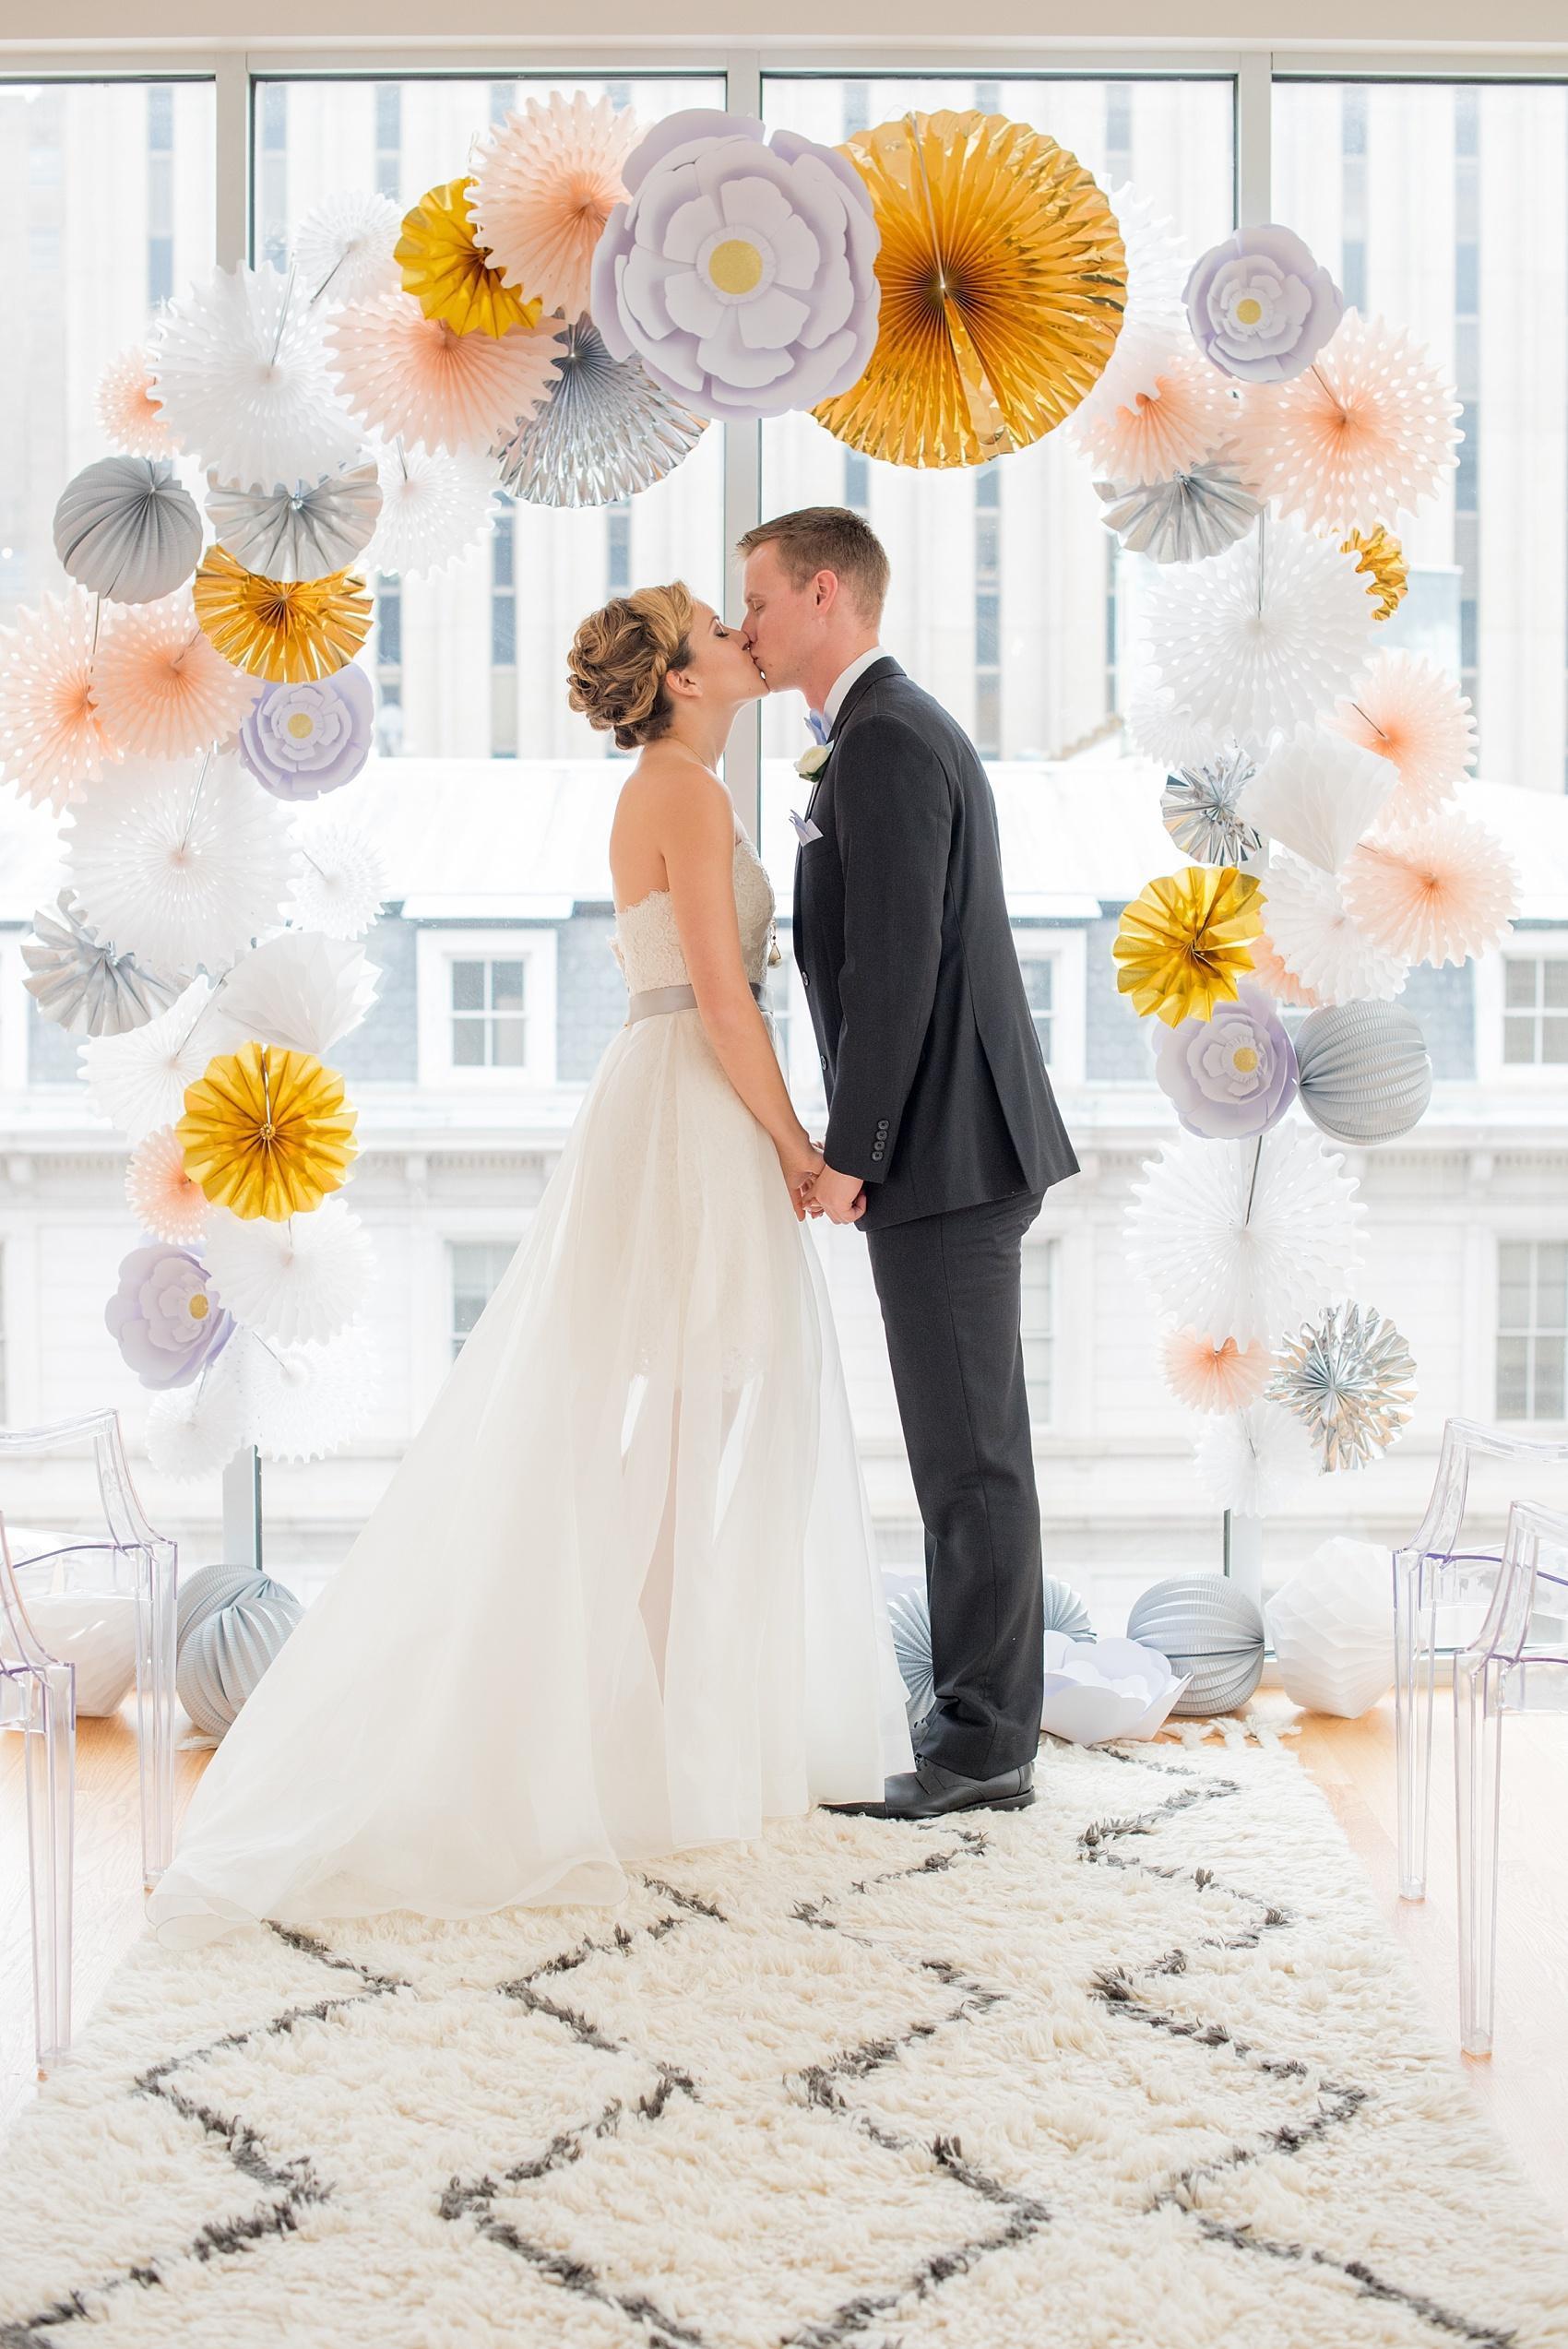 The Glass Box Wedding Photos • Serenity and Rose Quartz | Raleigh ...